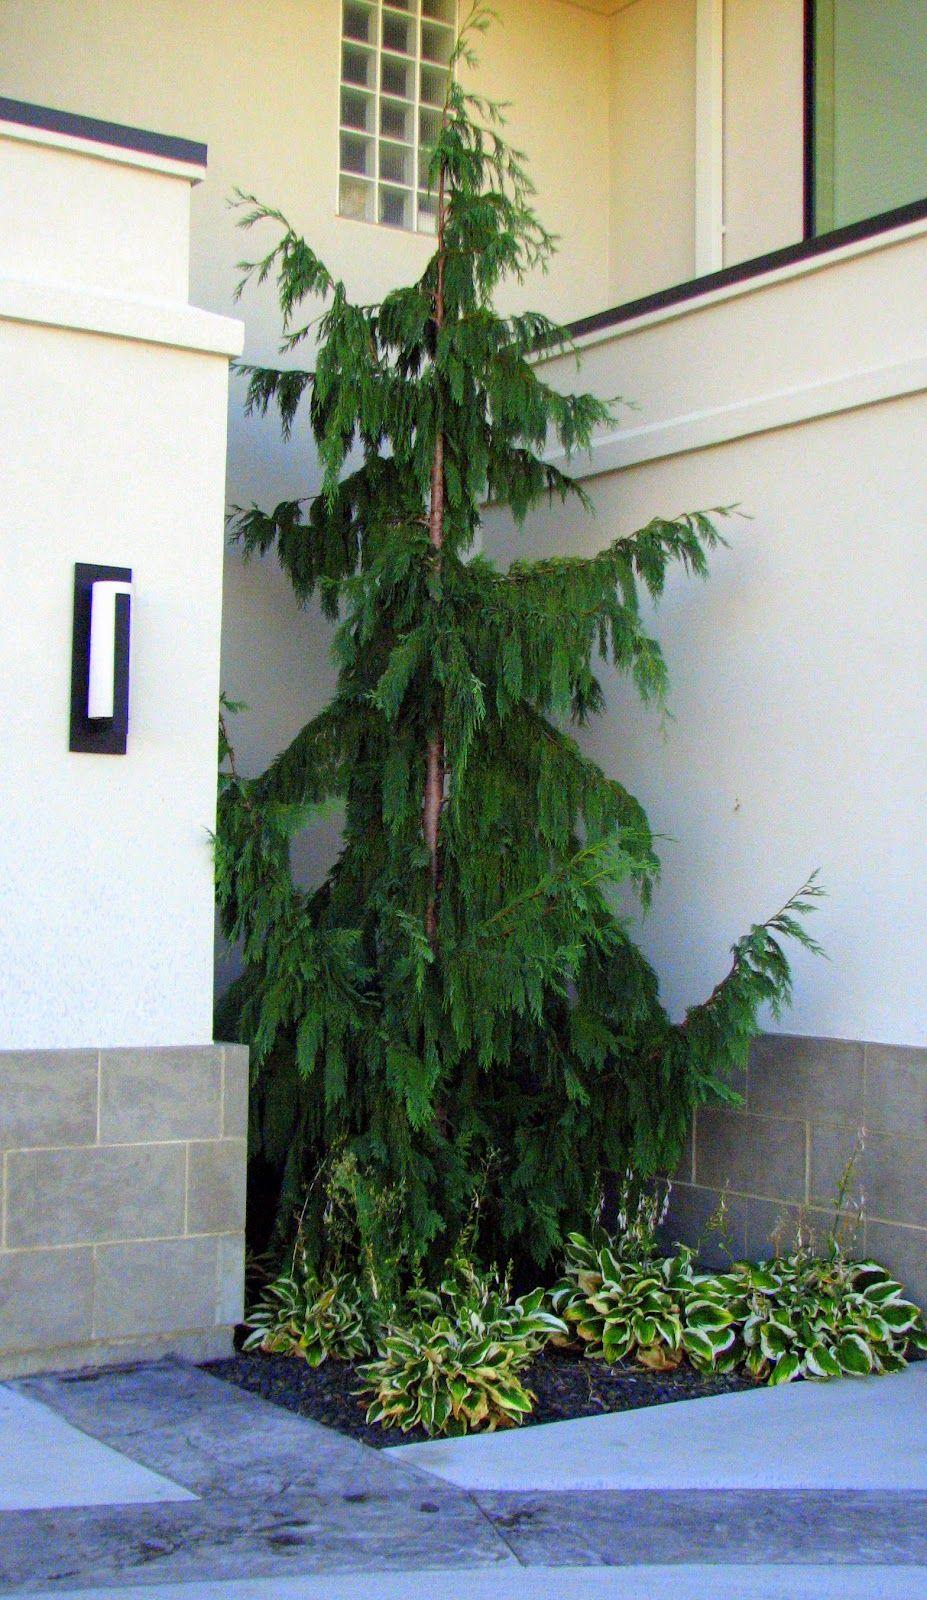 Landscaping Ideas For Cedar Trees : Trees garden cedar landscape design outdoor ideas